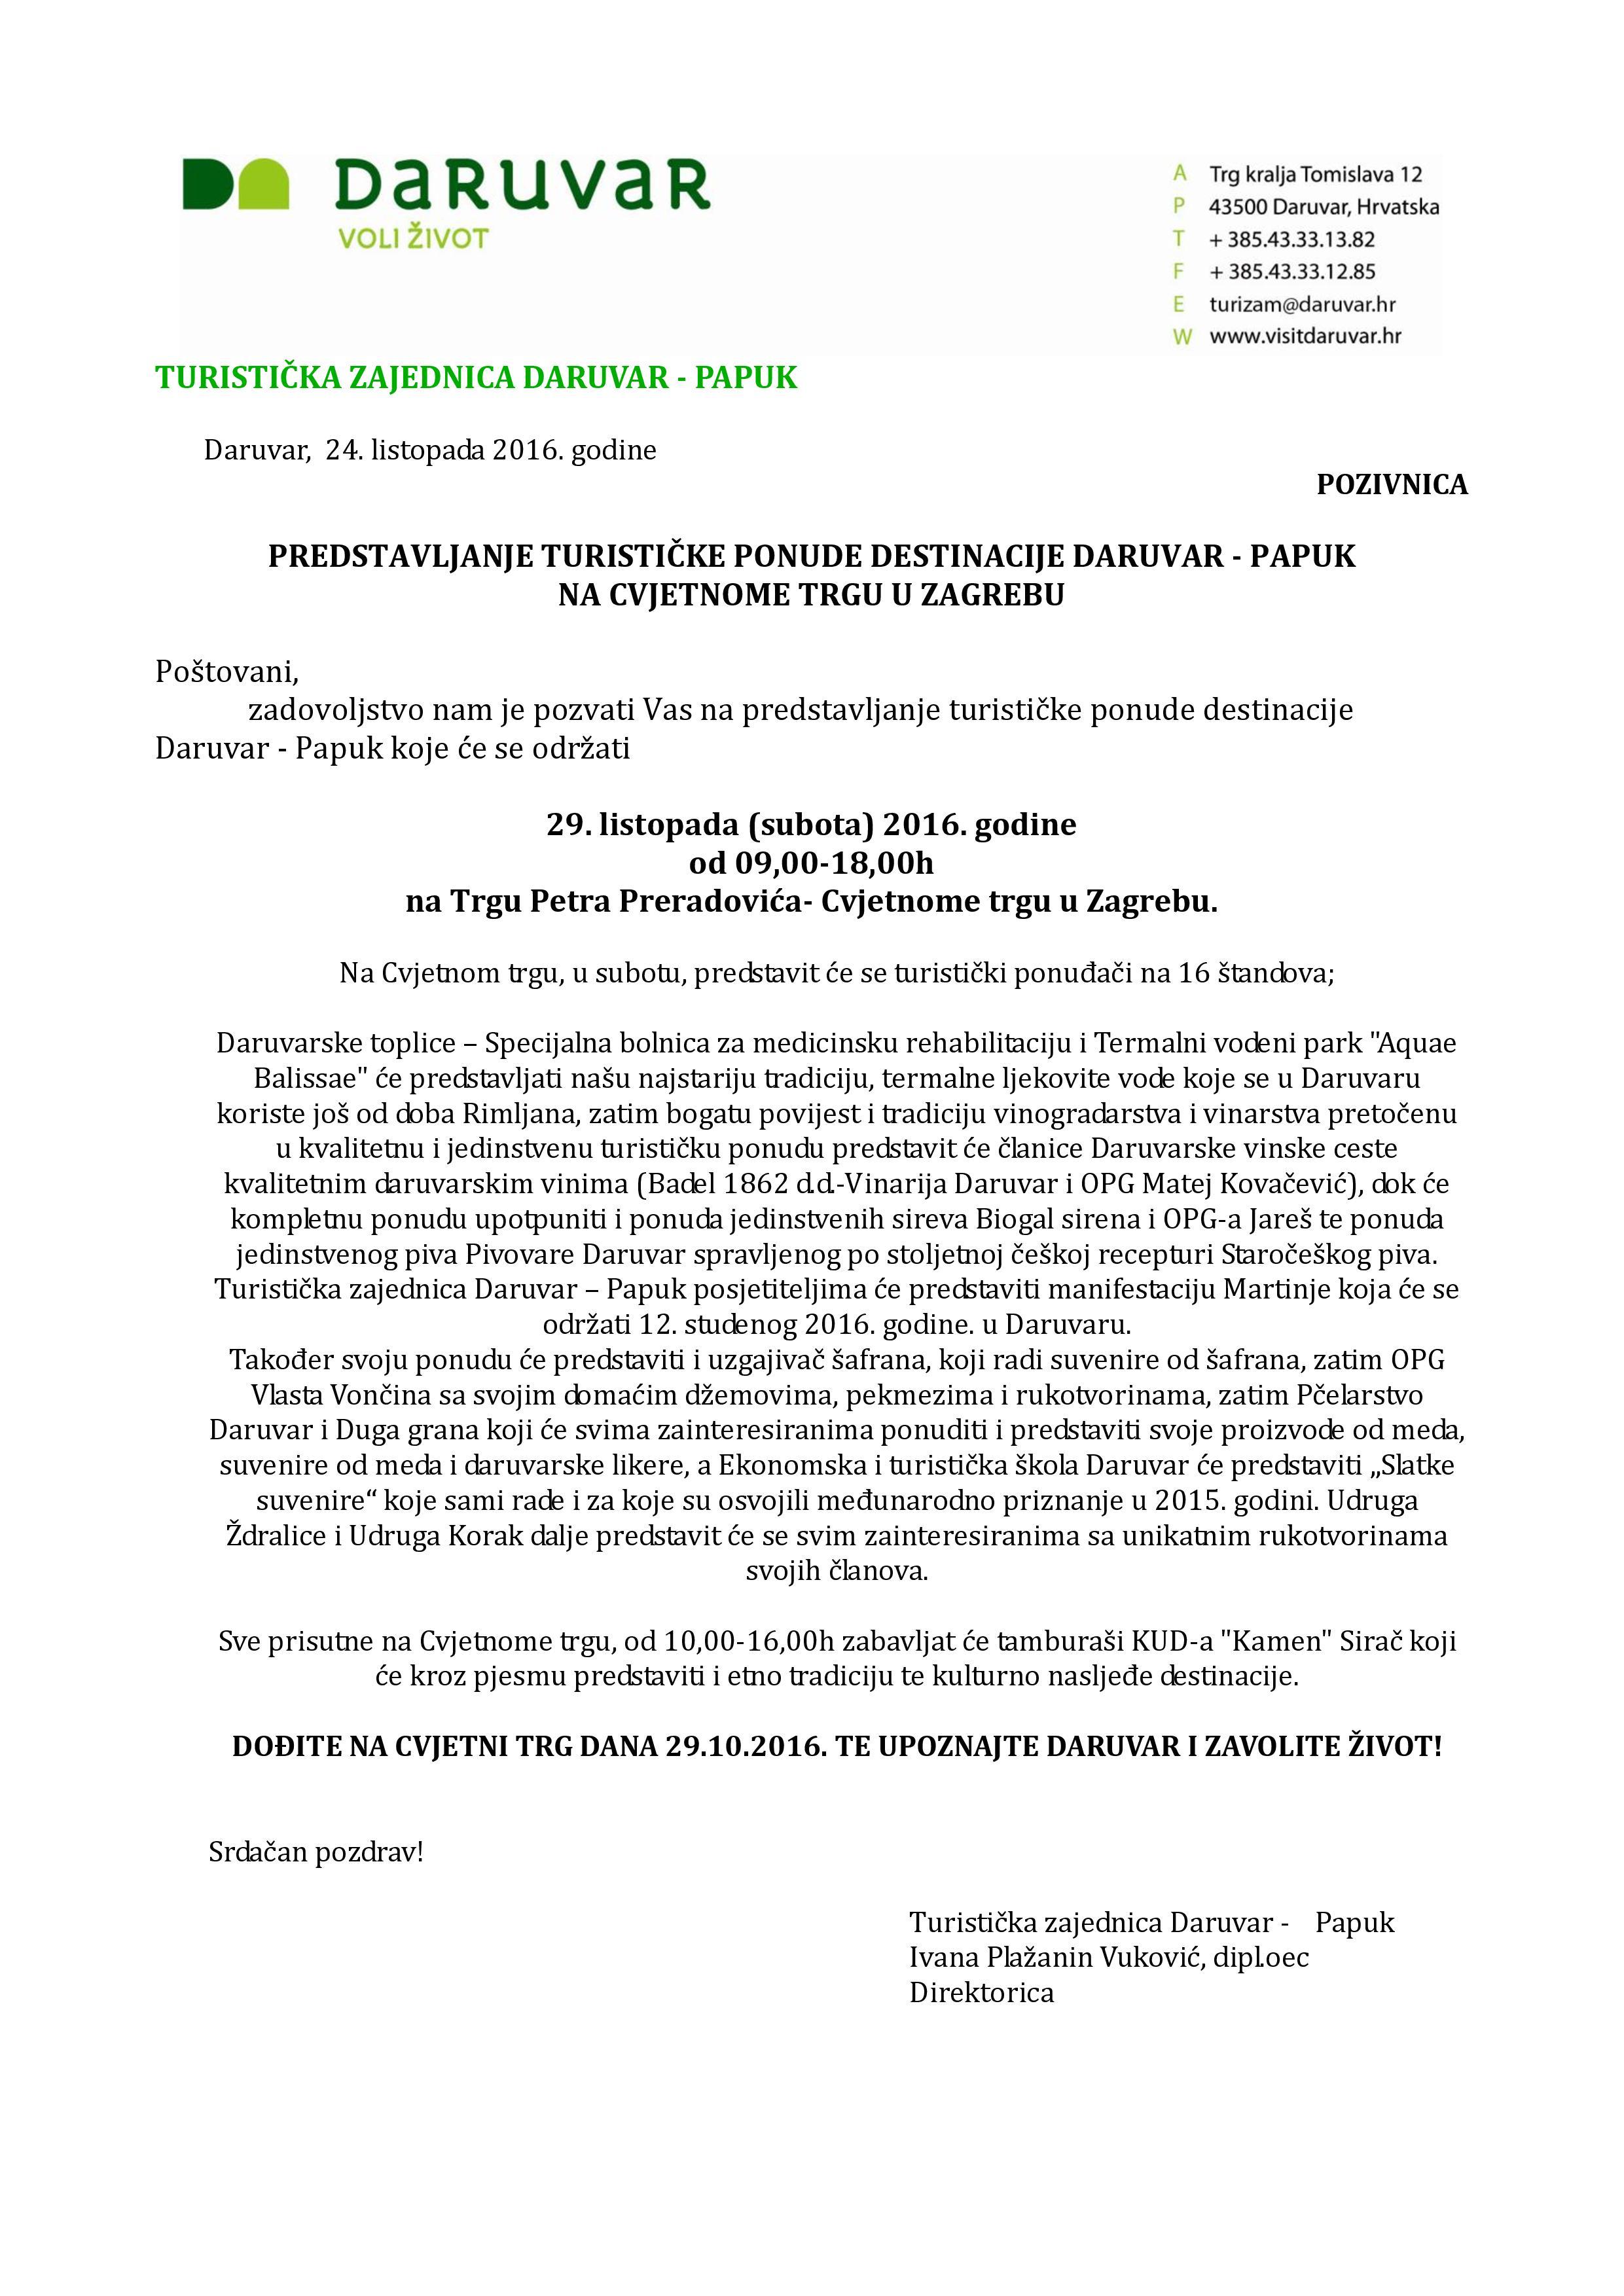 predstavljanje-na-cvjetnom-trgu-29-10-2016-poziv-page-001